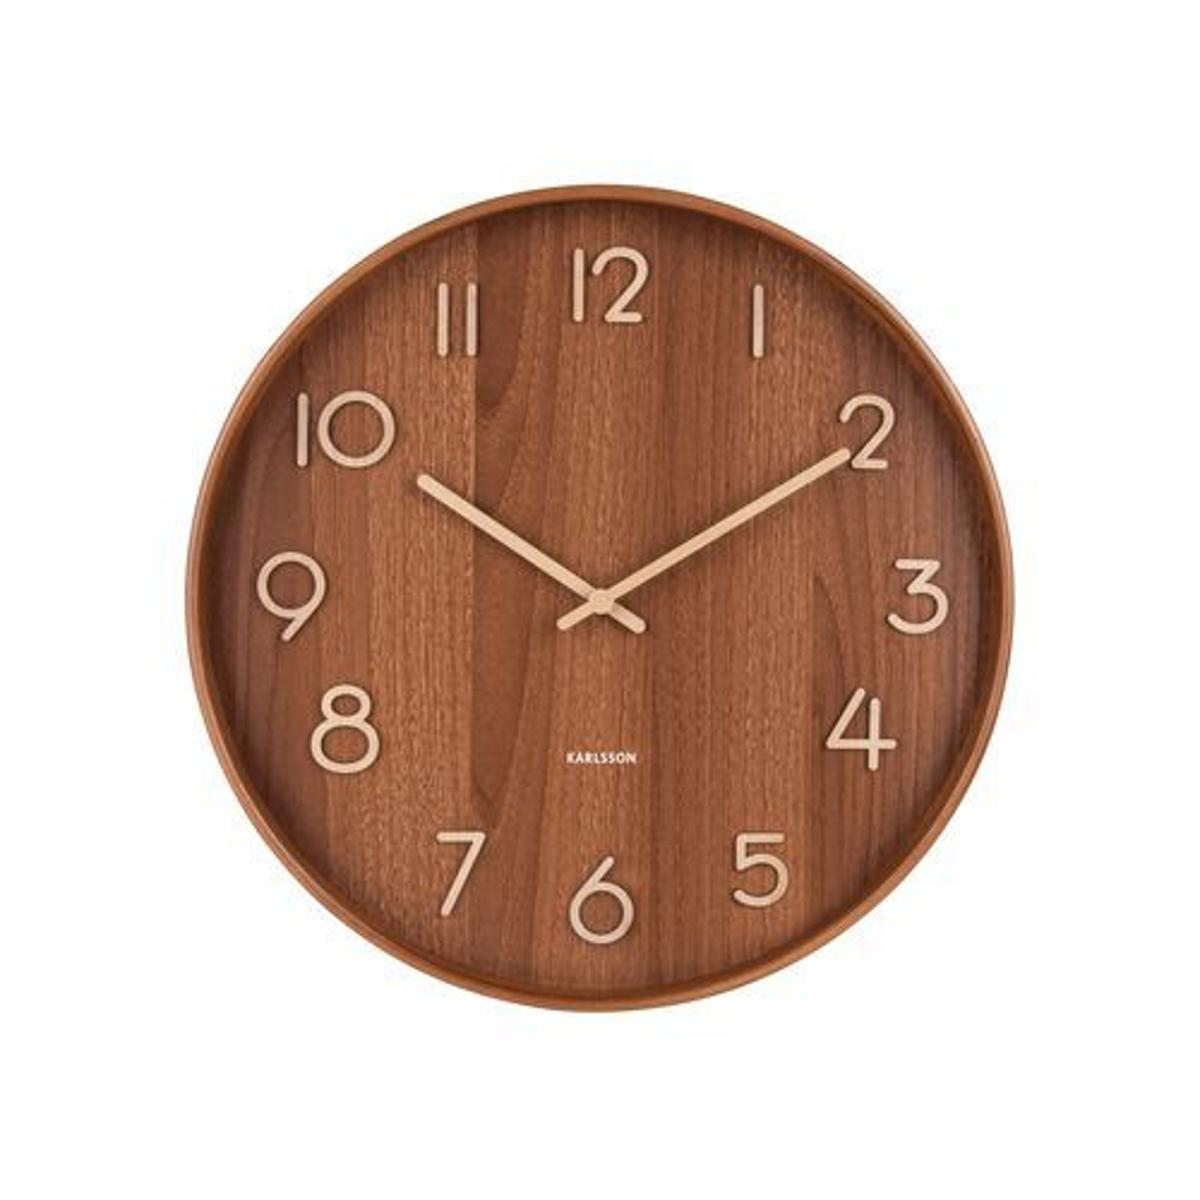 Meilleure horloge